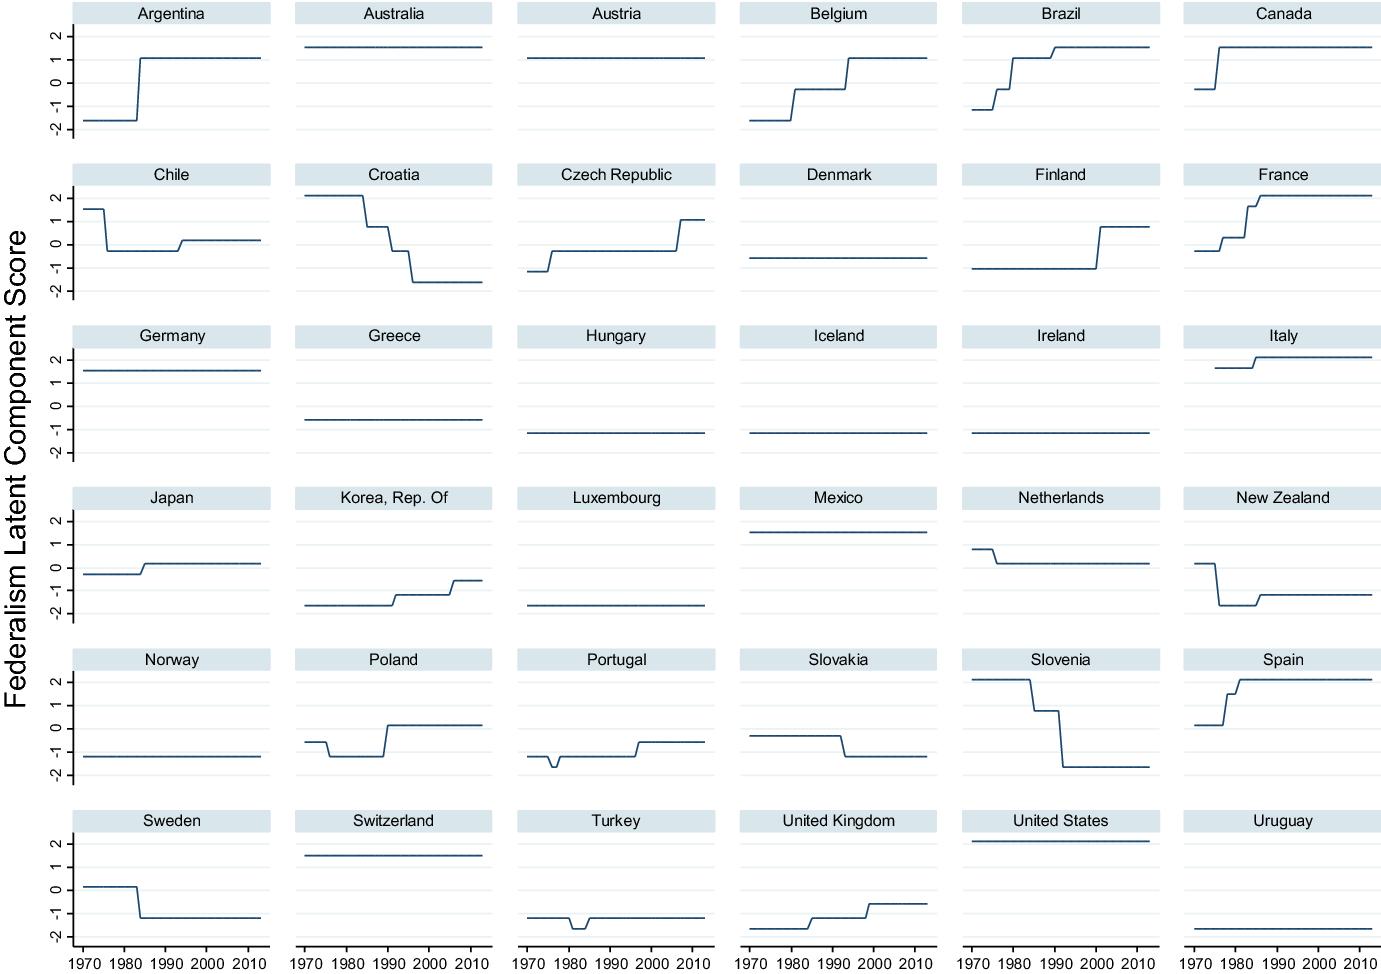 Political economy of pension reforms: an empirical